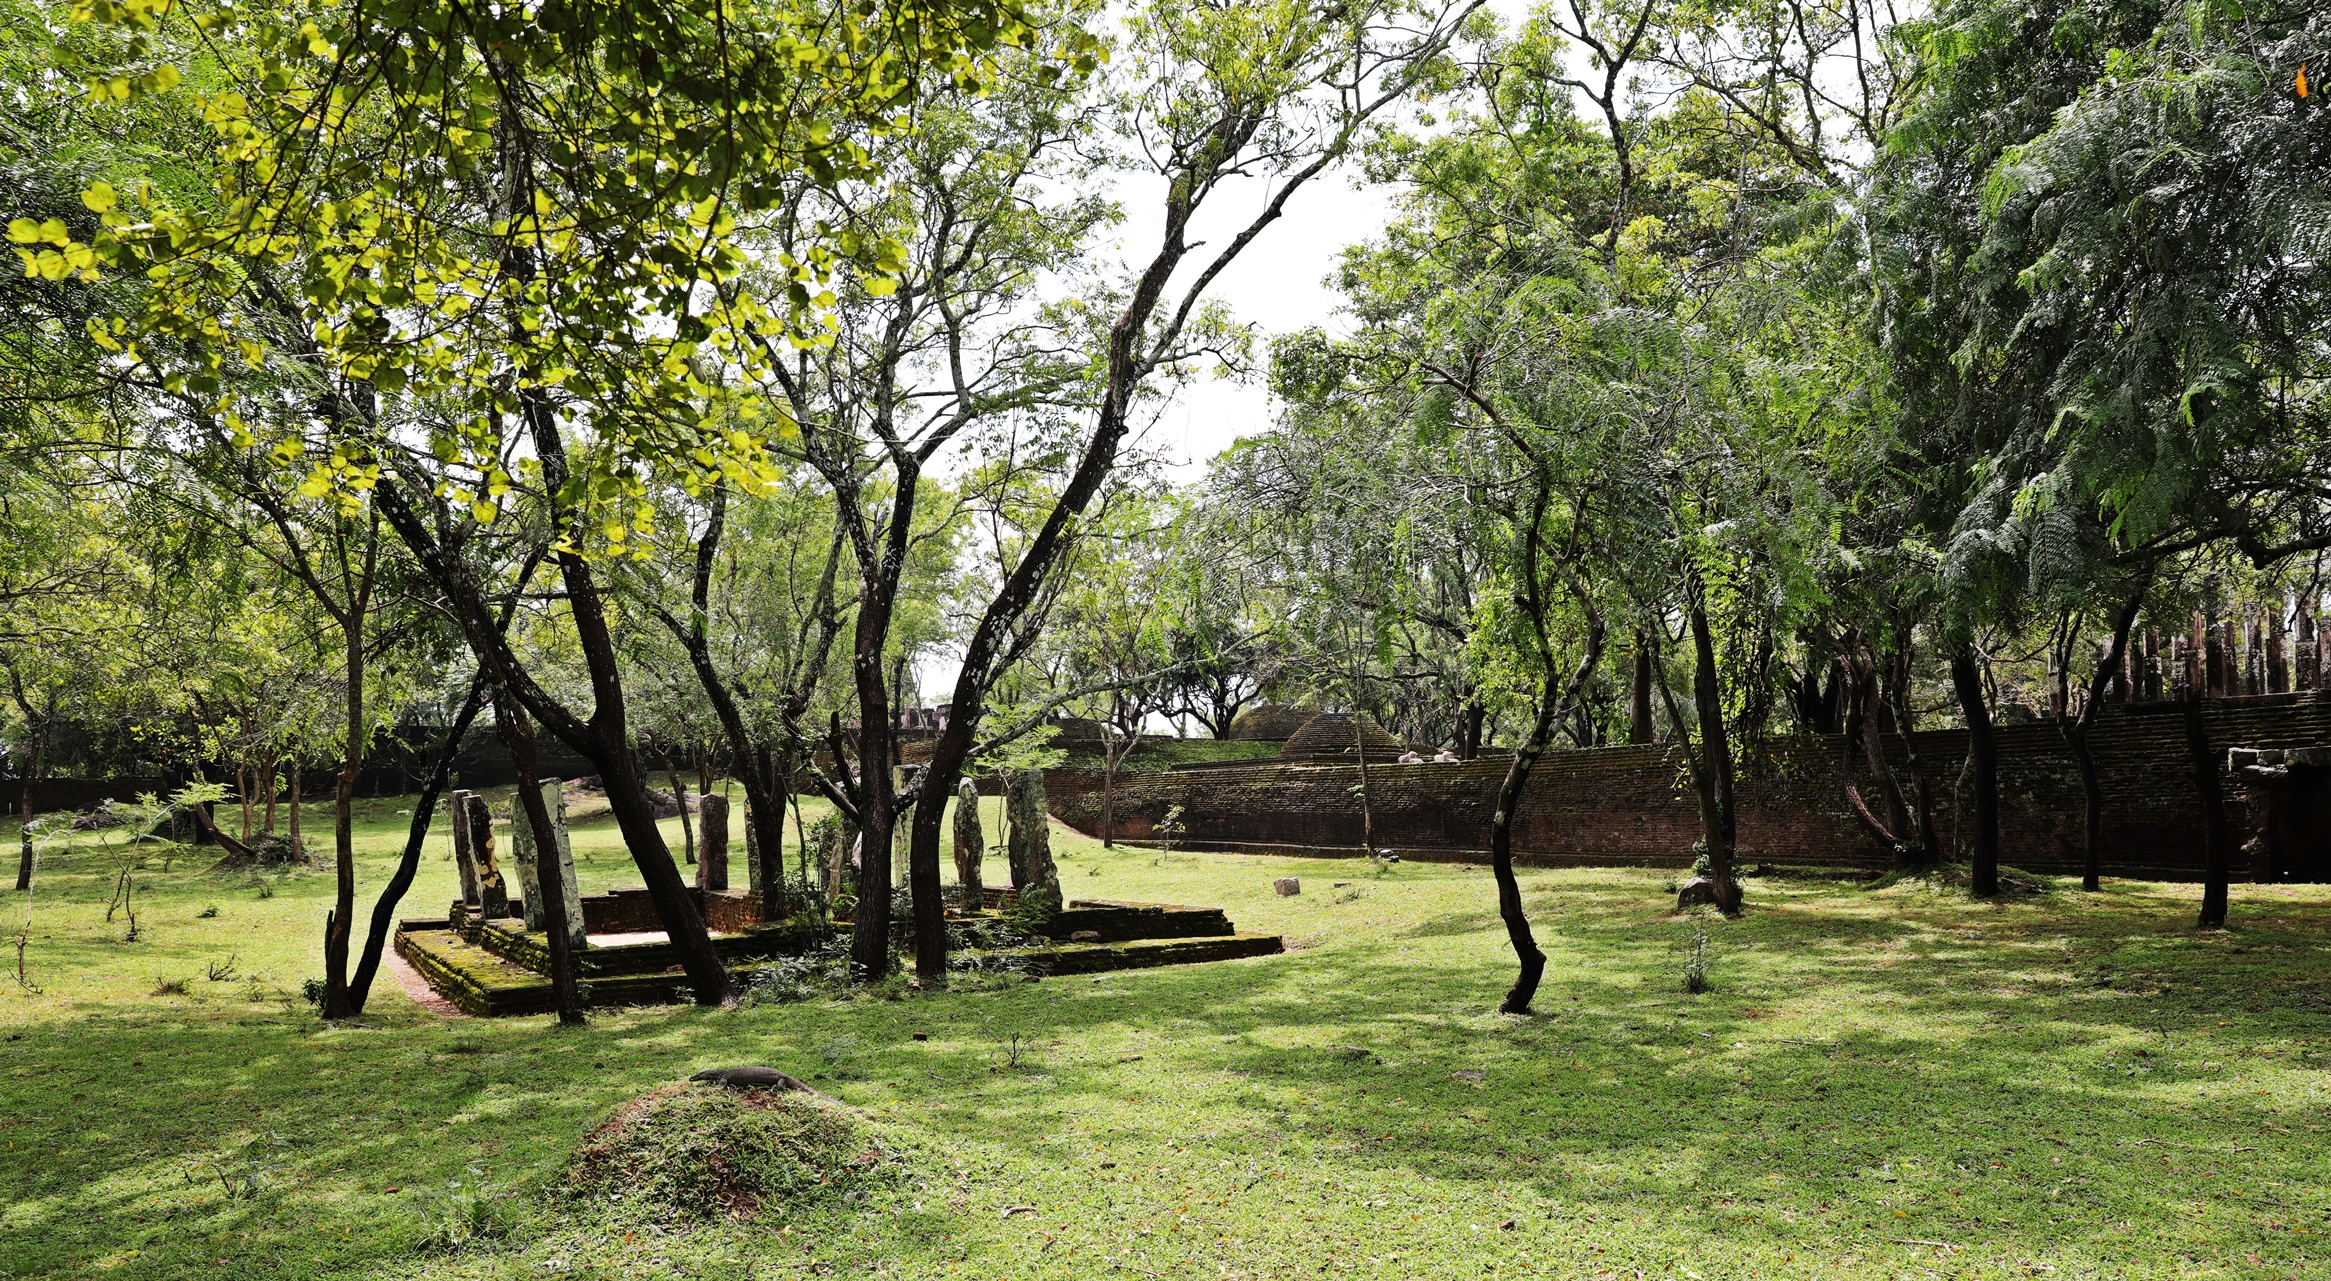 Alahana Pirivena Monastery, Polonnaruwa